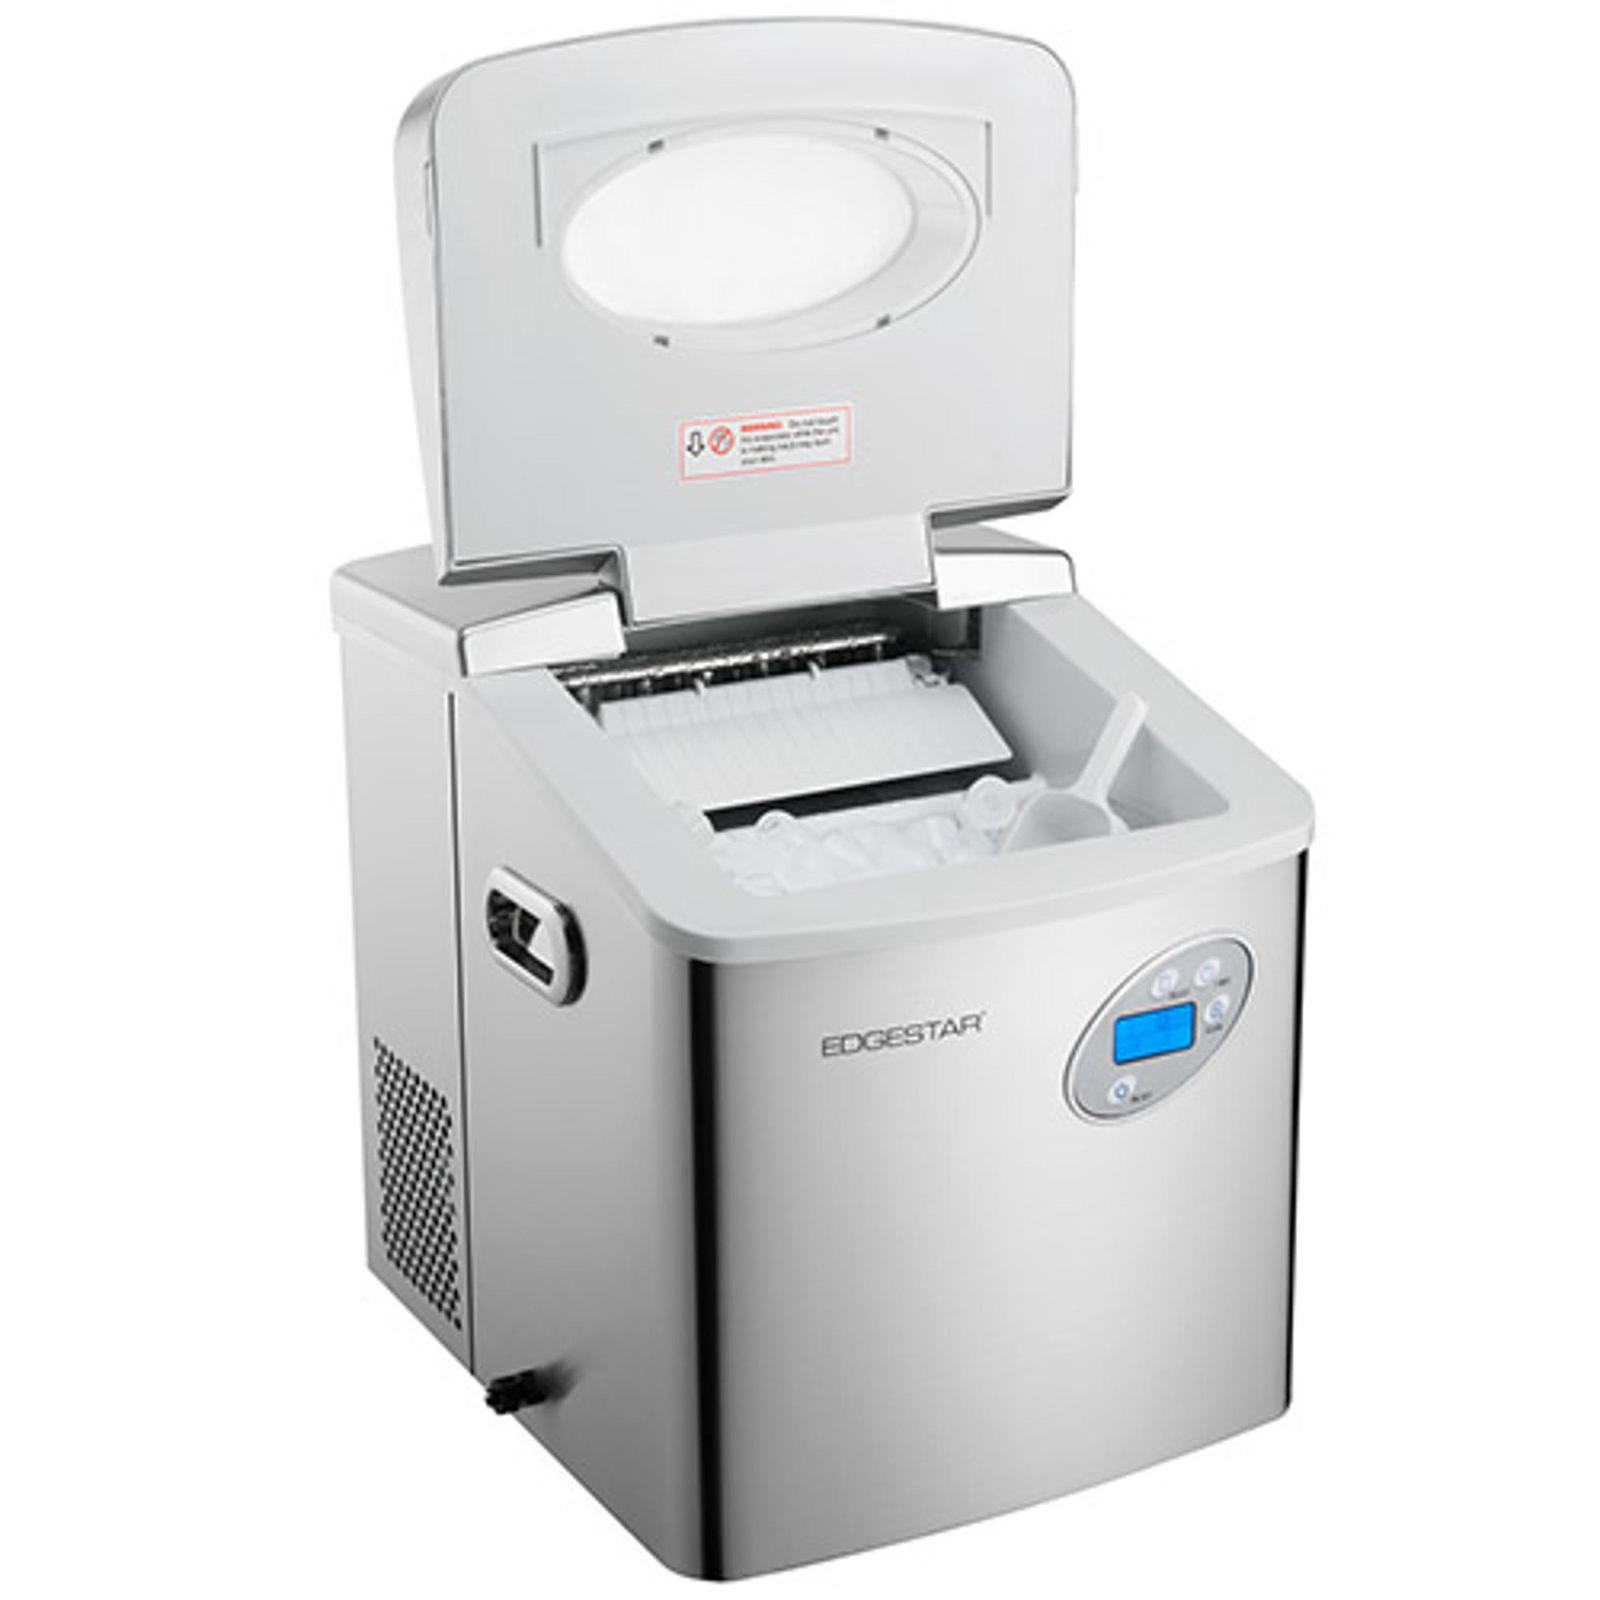 EdgeStar EdgeStar IP250SS IP210BL Portable Ice Maker W/Innovative Water  Reuse Design U2013 Black 2